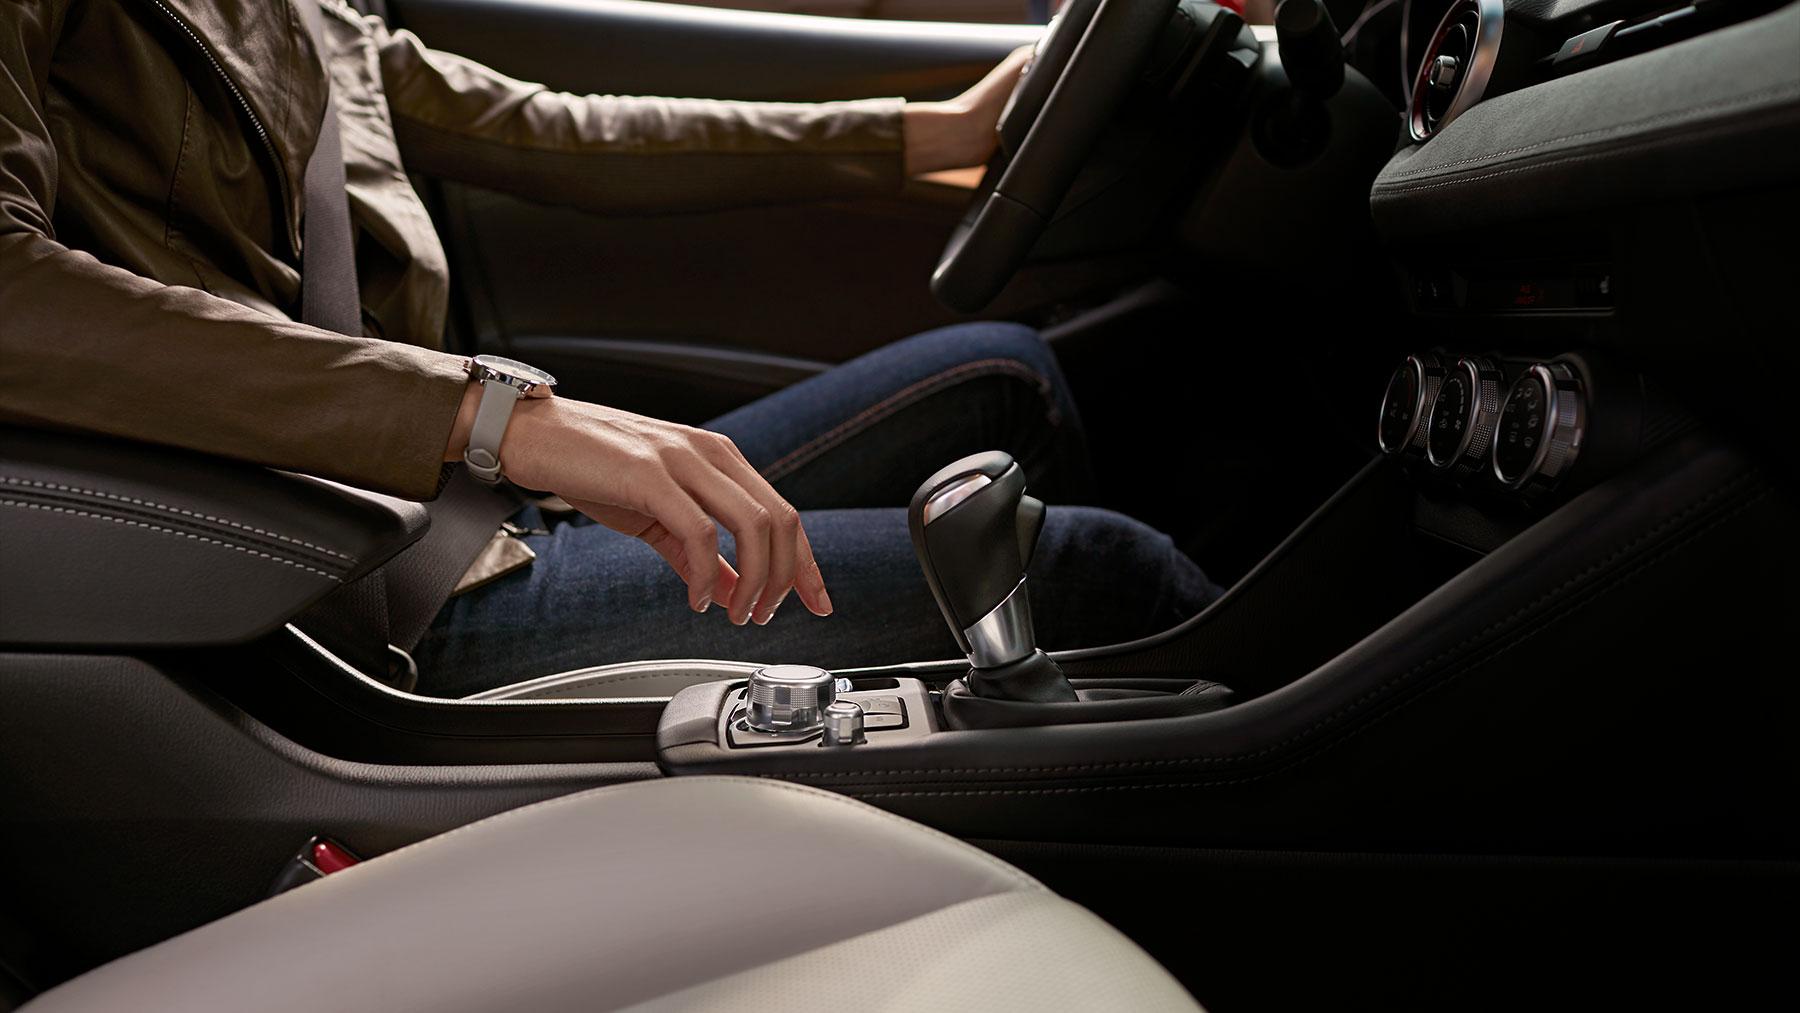 Convenient Amenities in the Mazda CX-3